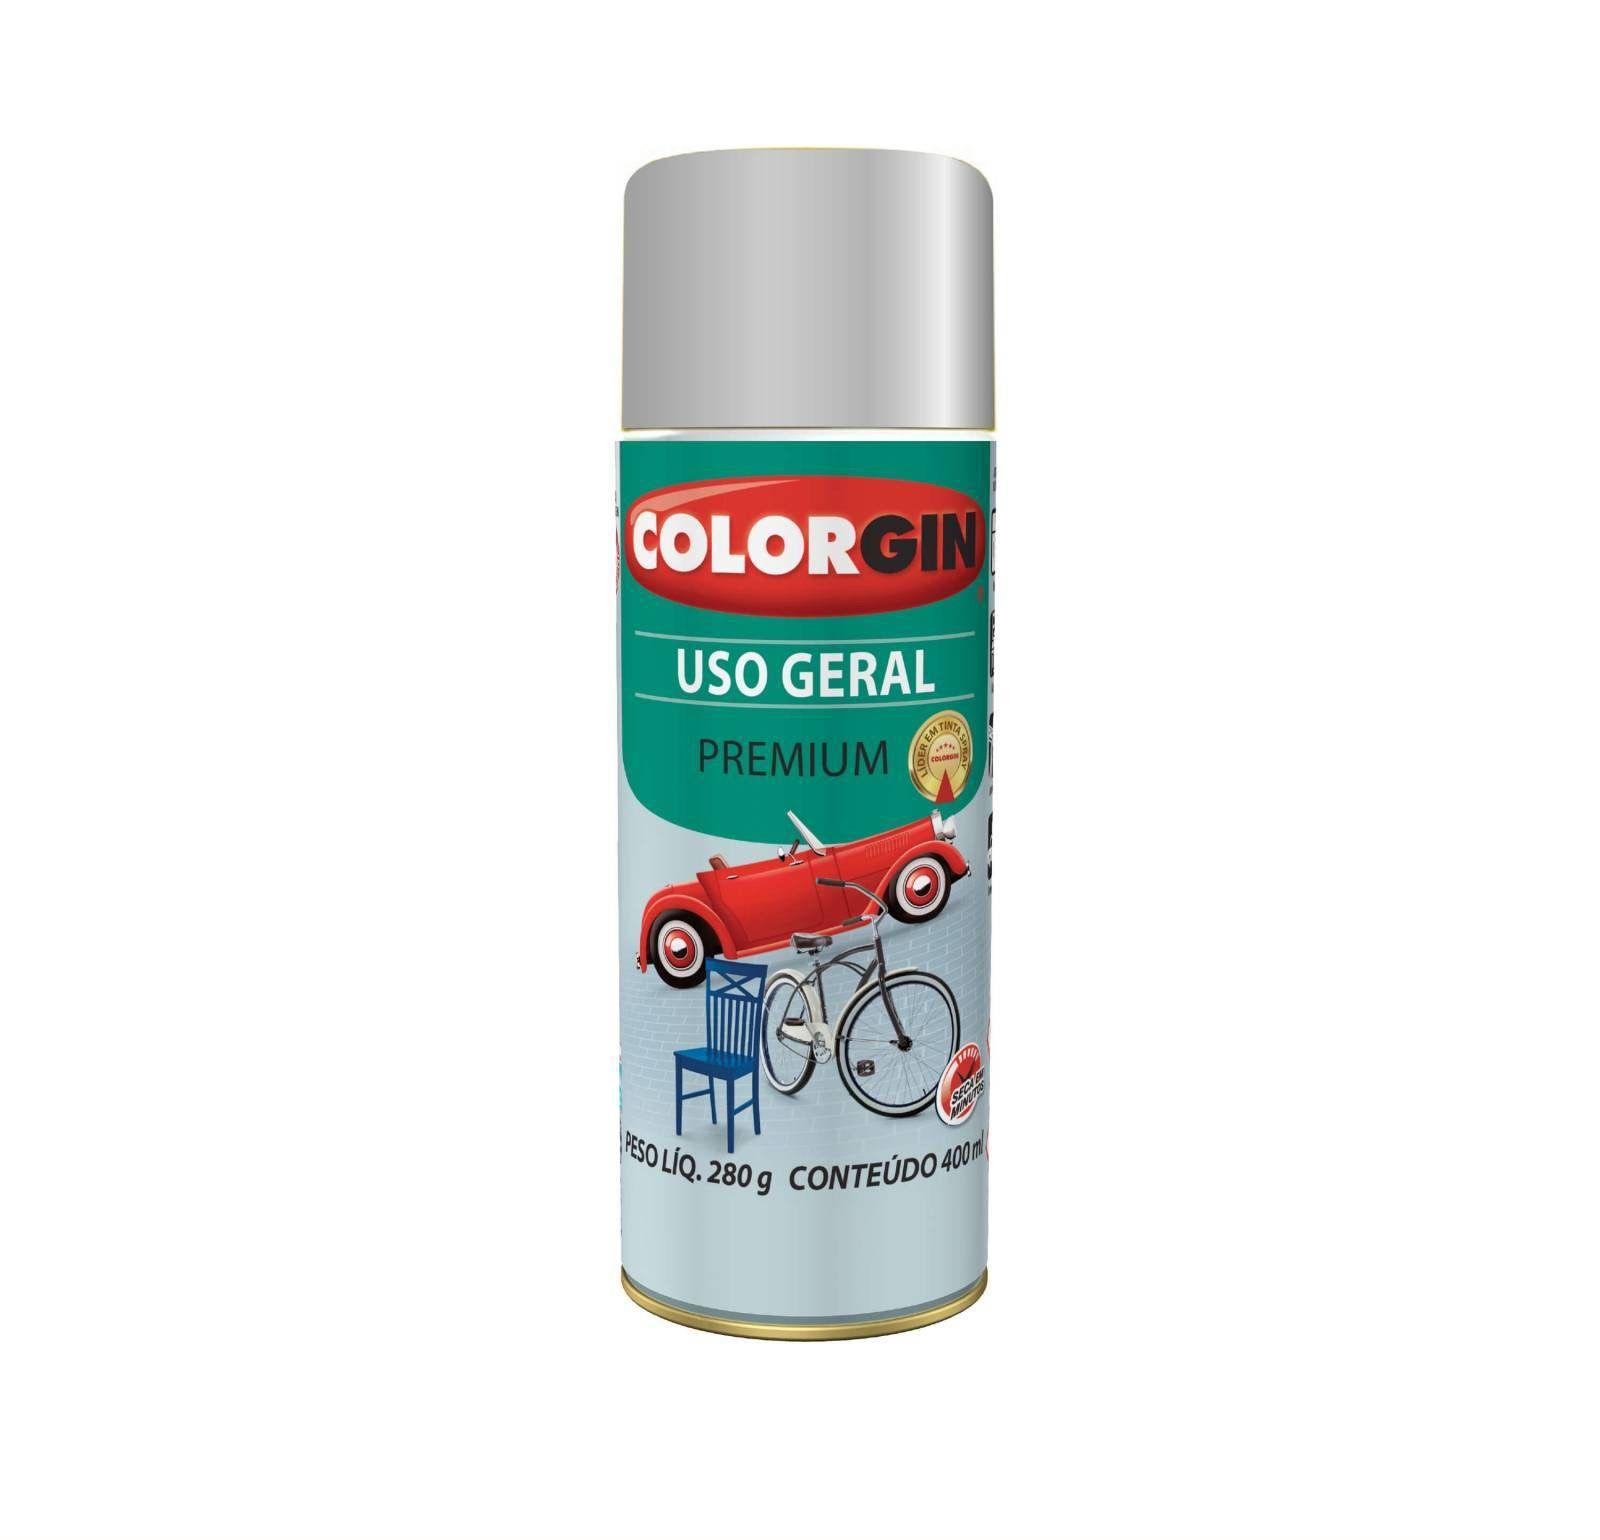 Spray 5706 Uso Geral Prata Real Colorgin